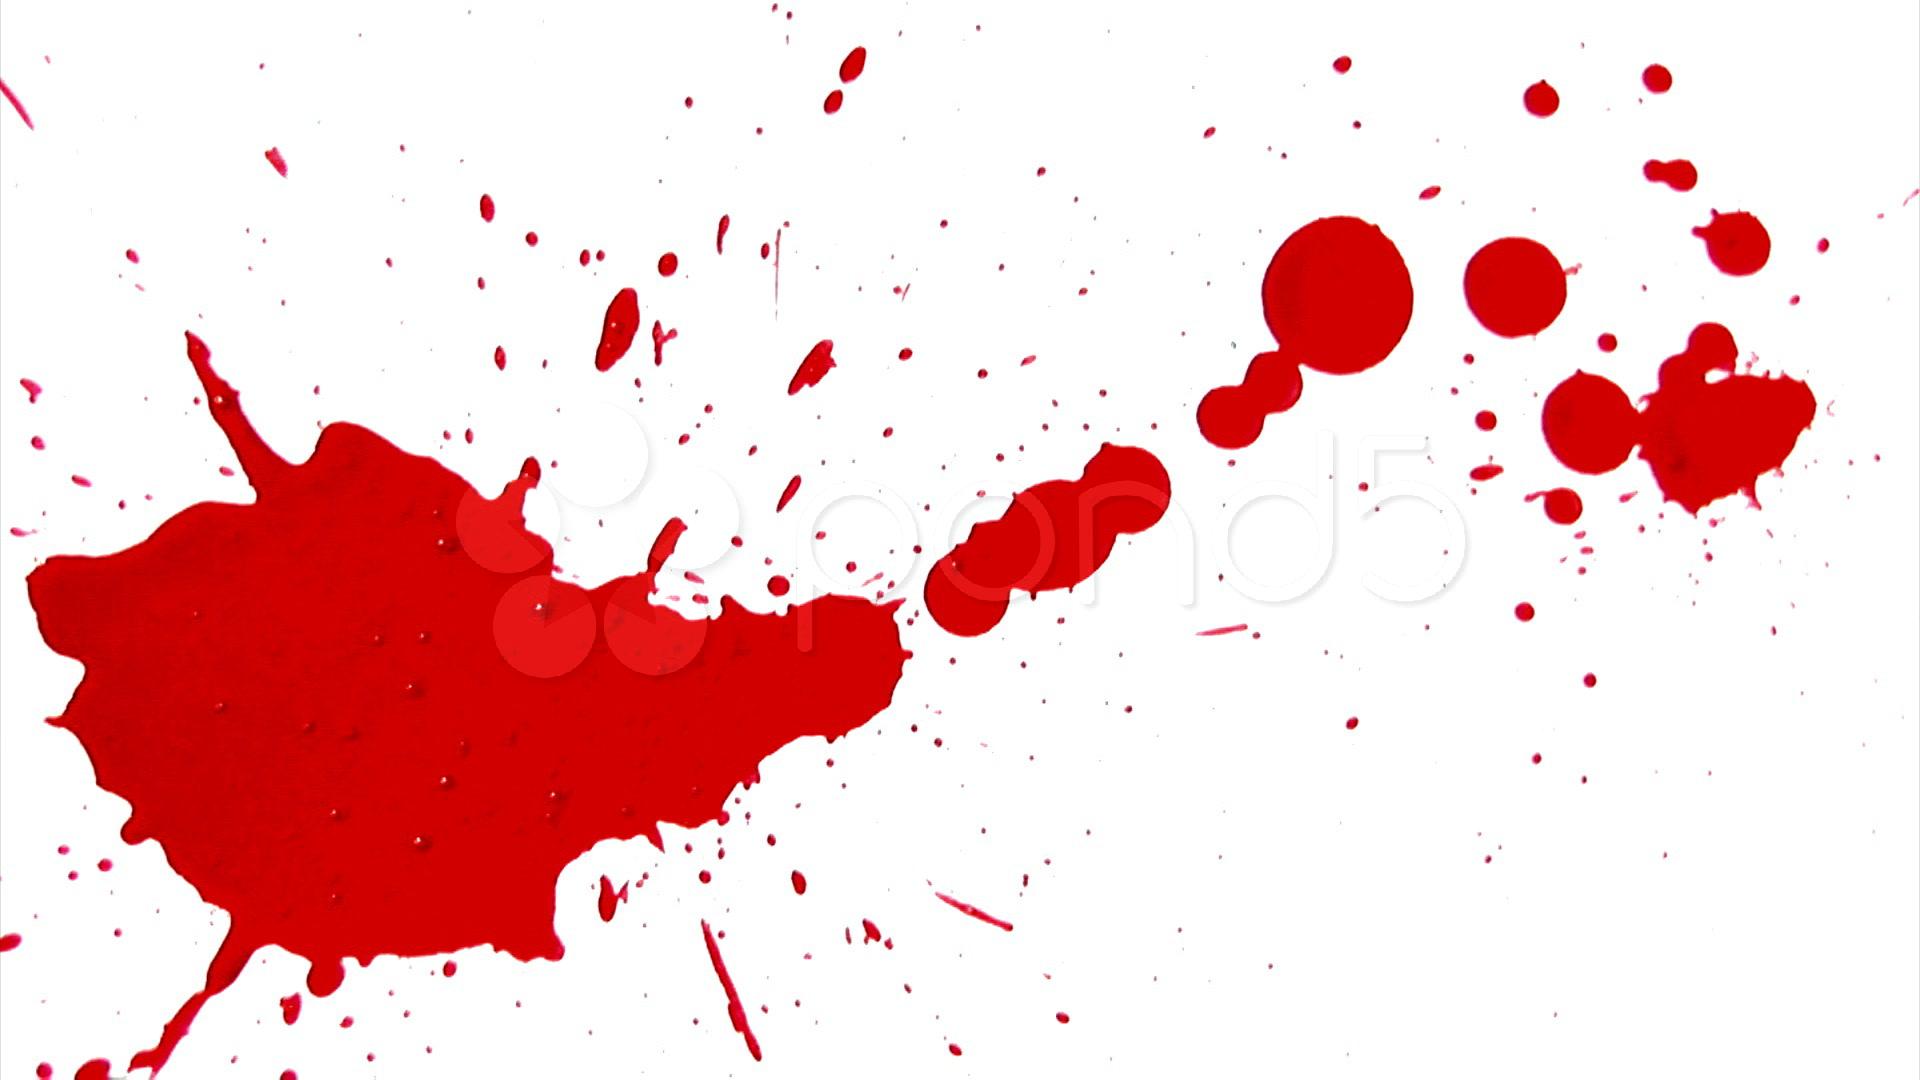 47+] Dexter Blood Splatter Wallpaper on WallpaperSafari